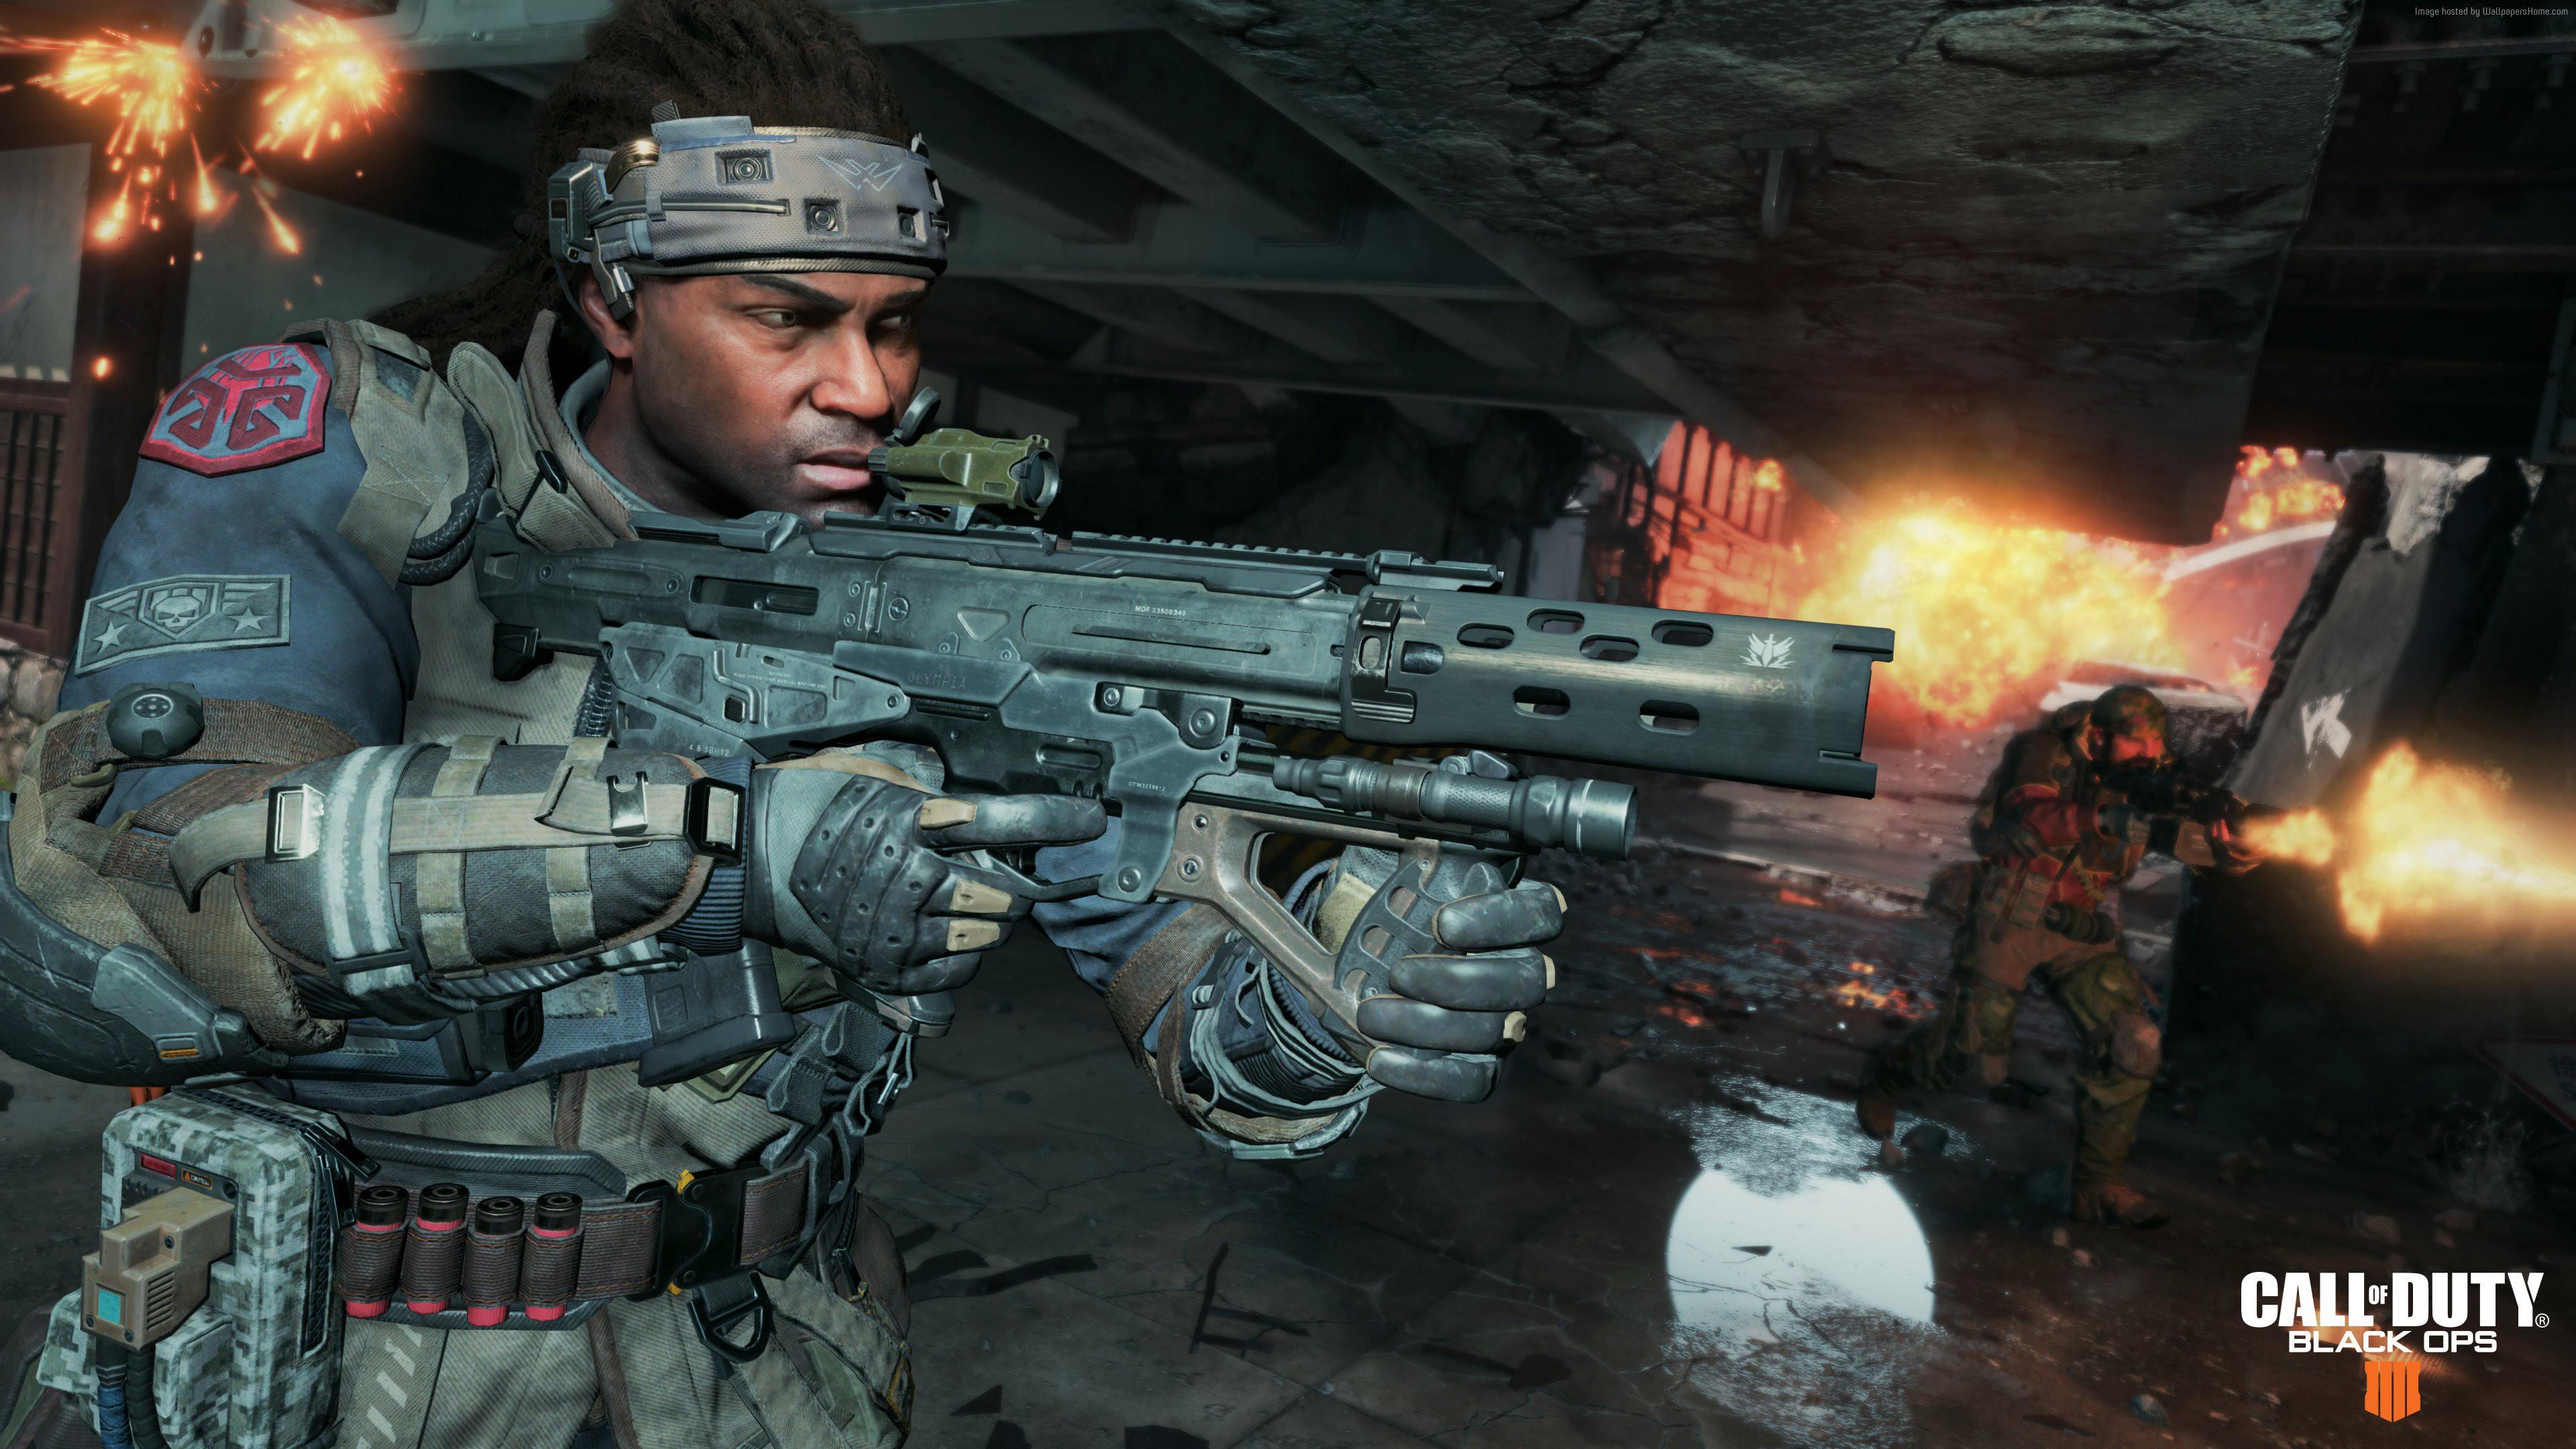 Wallpaper Call Of Duty Black Ops 4 Screenshot 4k Games